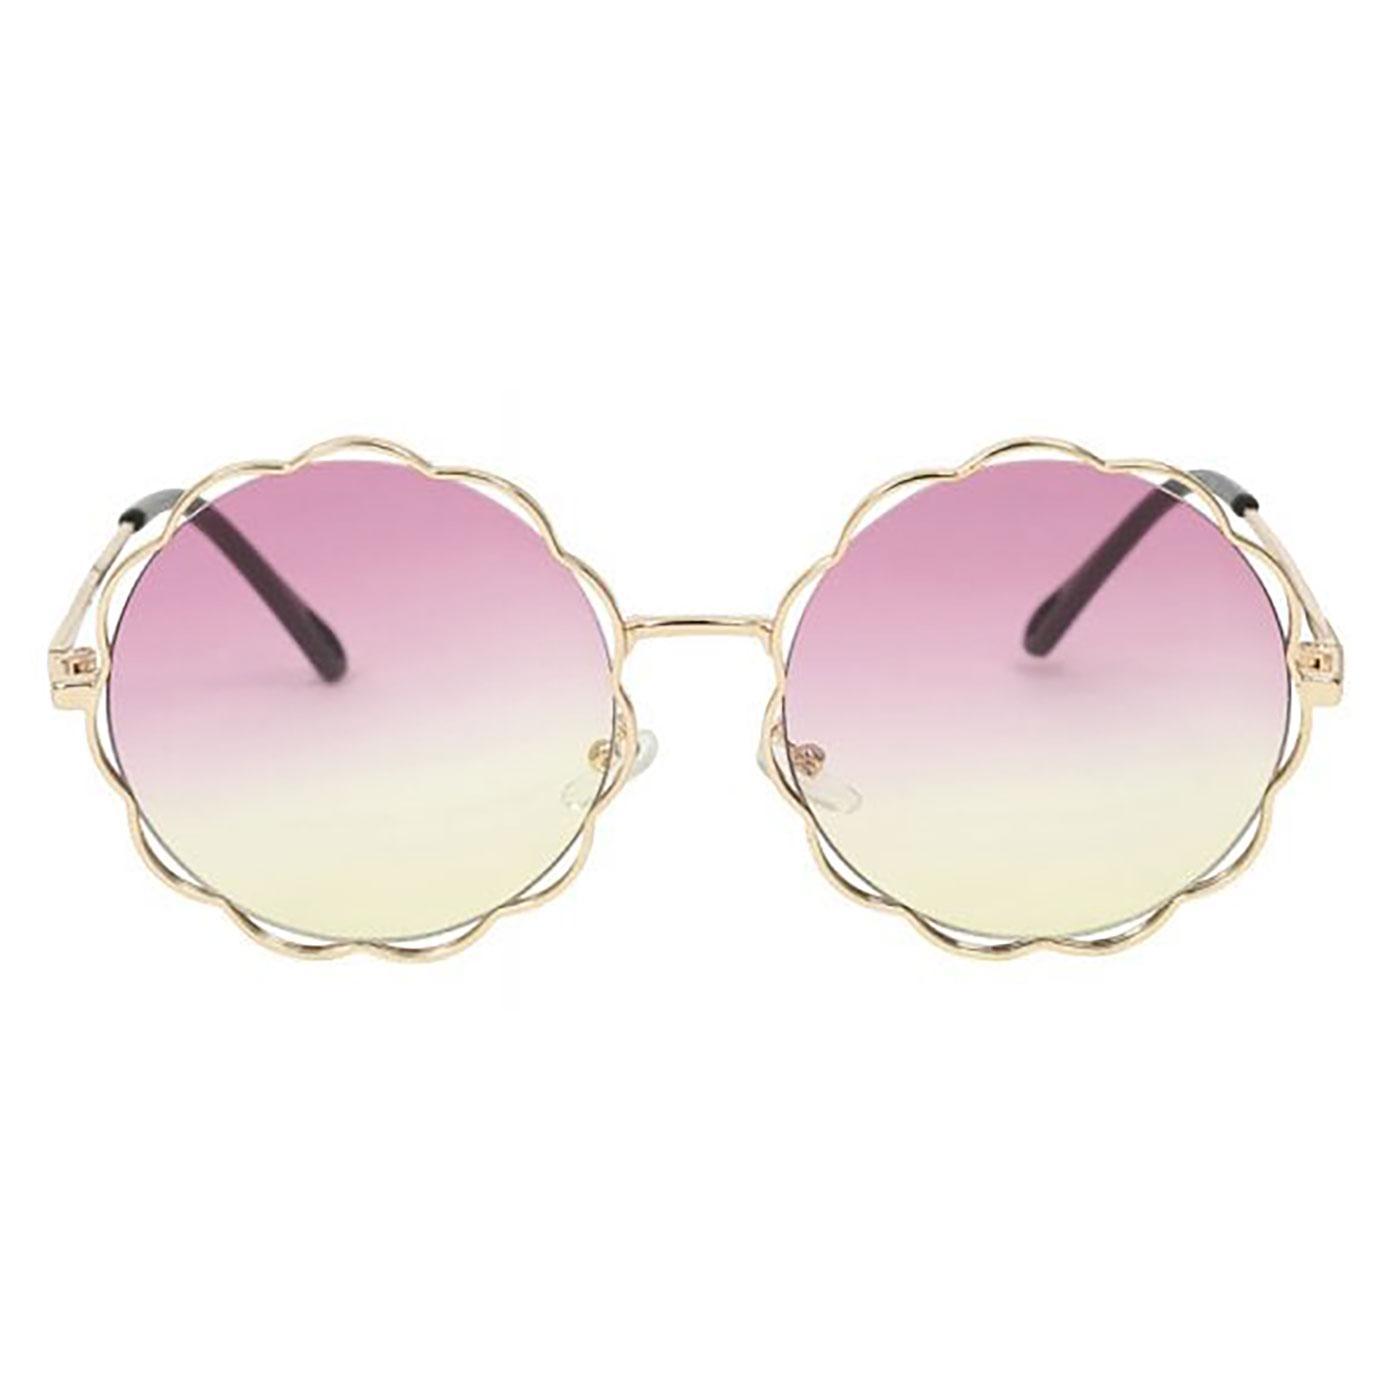 Vicki COLLECTIF Vintage Floral Shaped Sunglasses